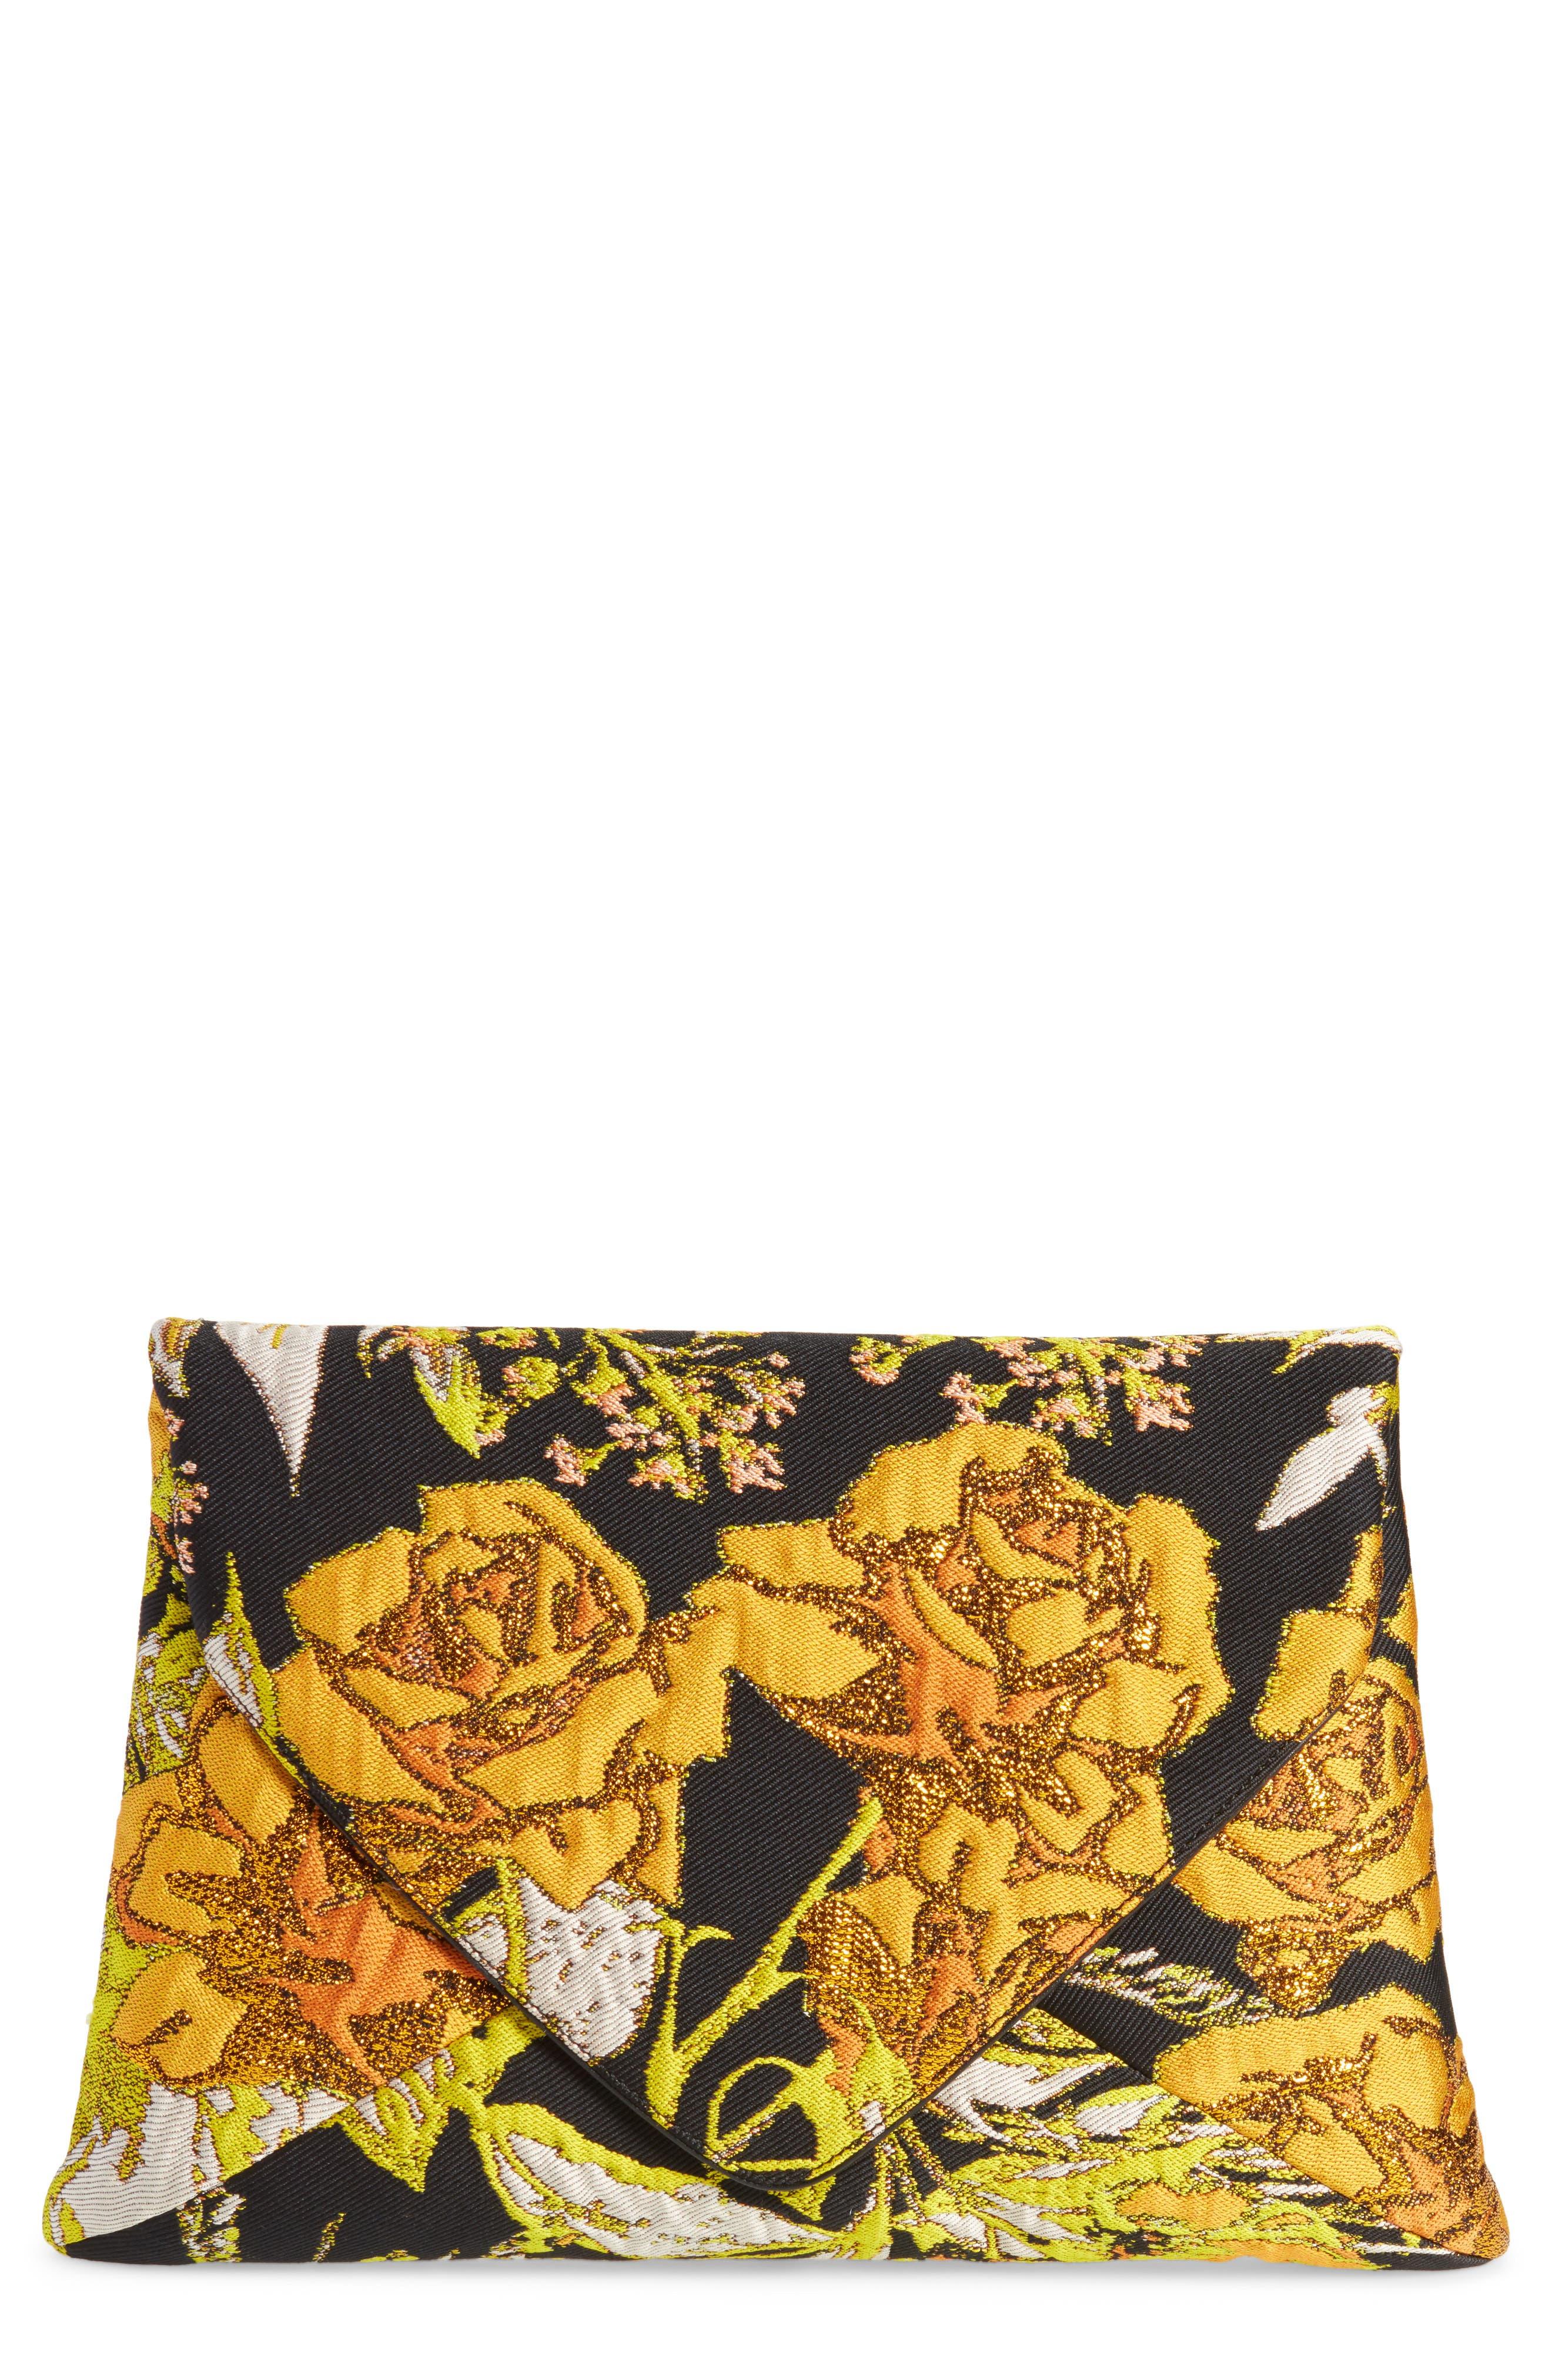 Main Image - Dries Van Noten Floral Jacquard Envelope Clutch